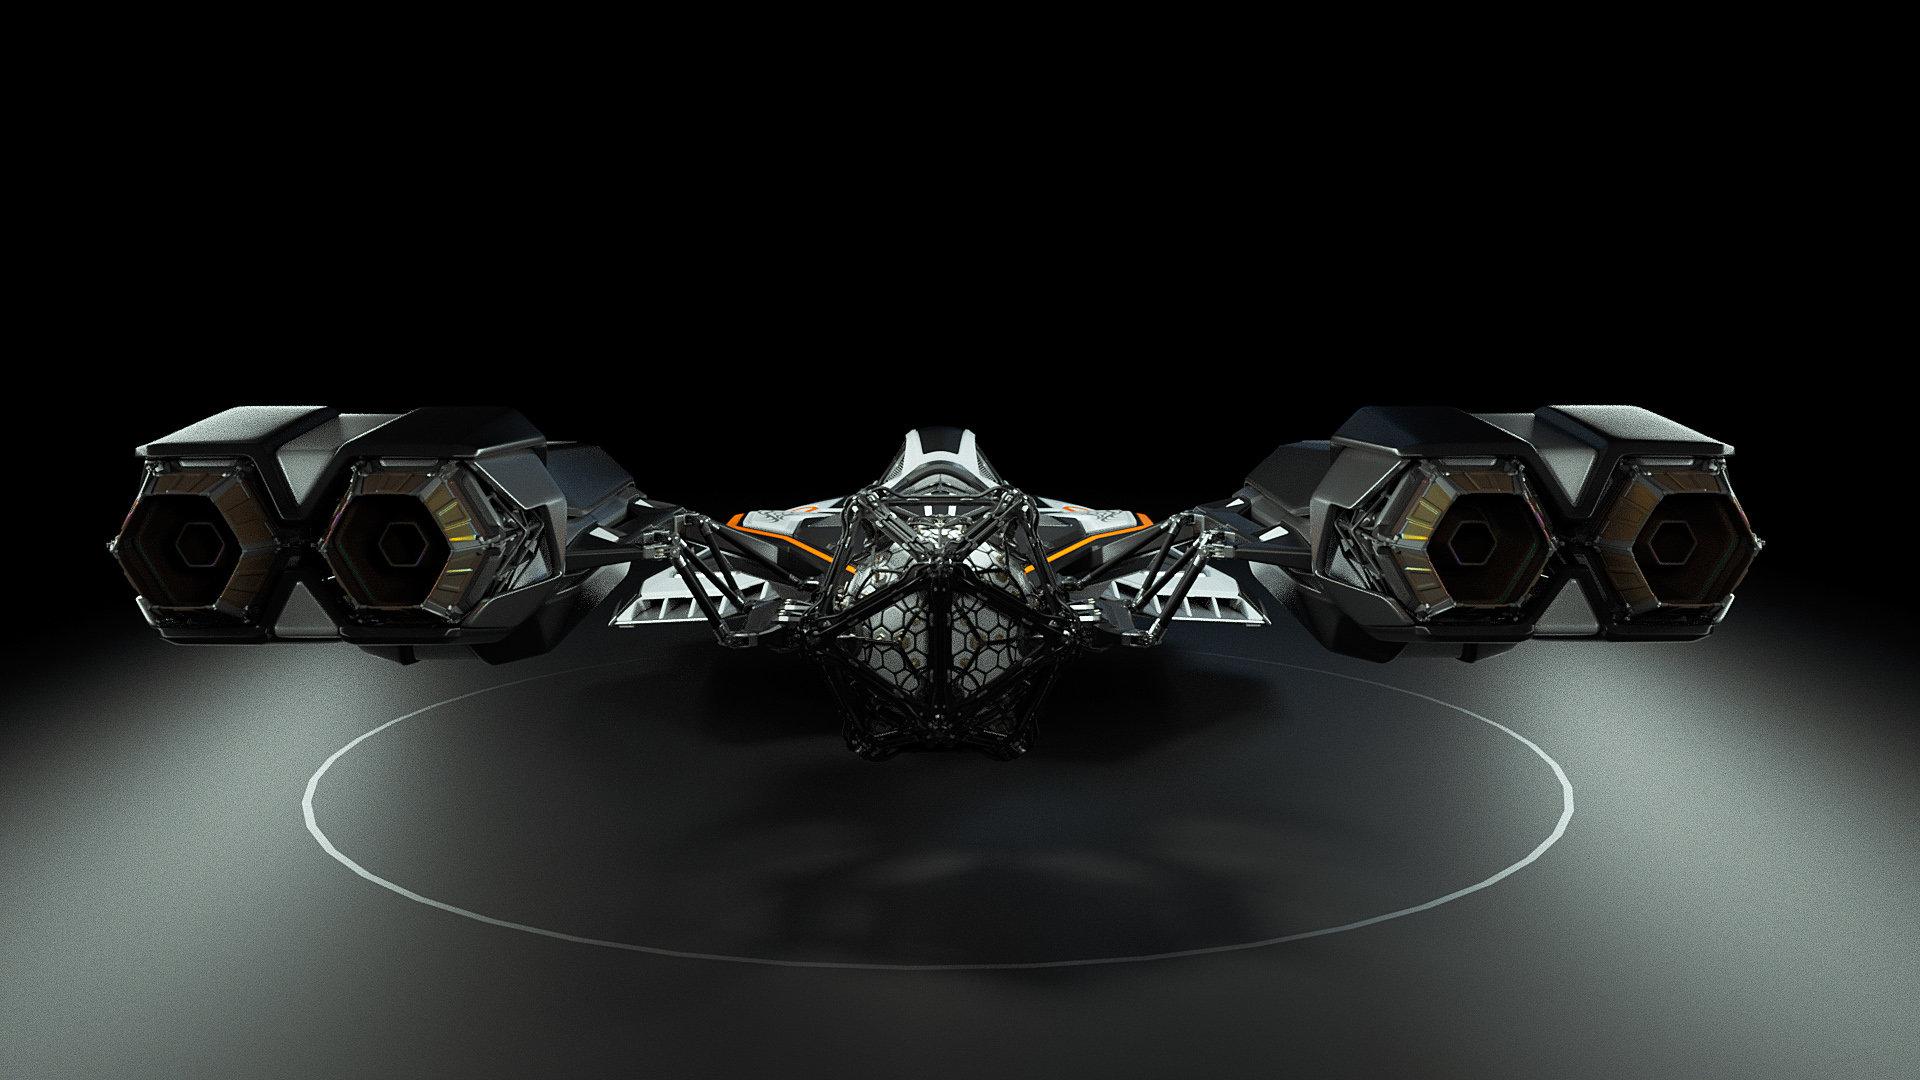 Johan de leenheer 3d spaceship faucer fuga mx230e 05